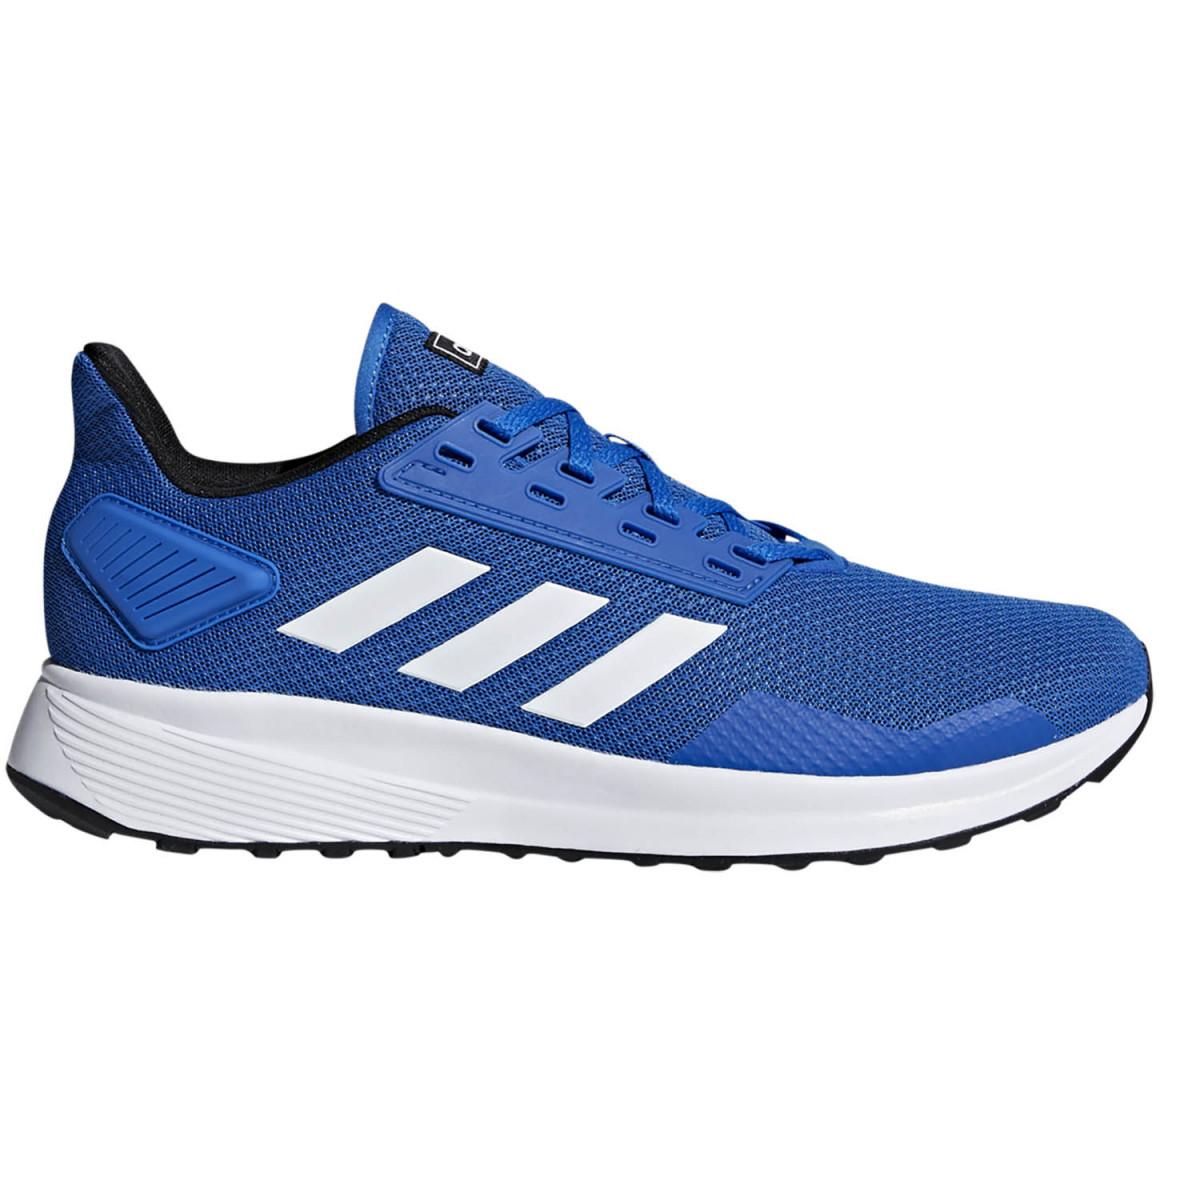 Zapatillas Adidas Duramo 9